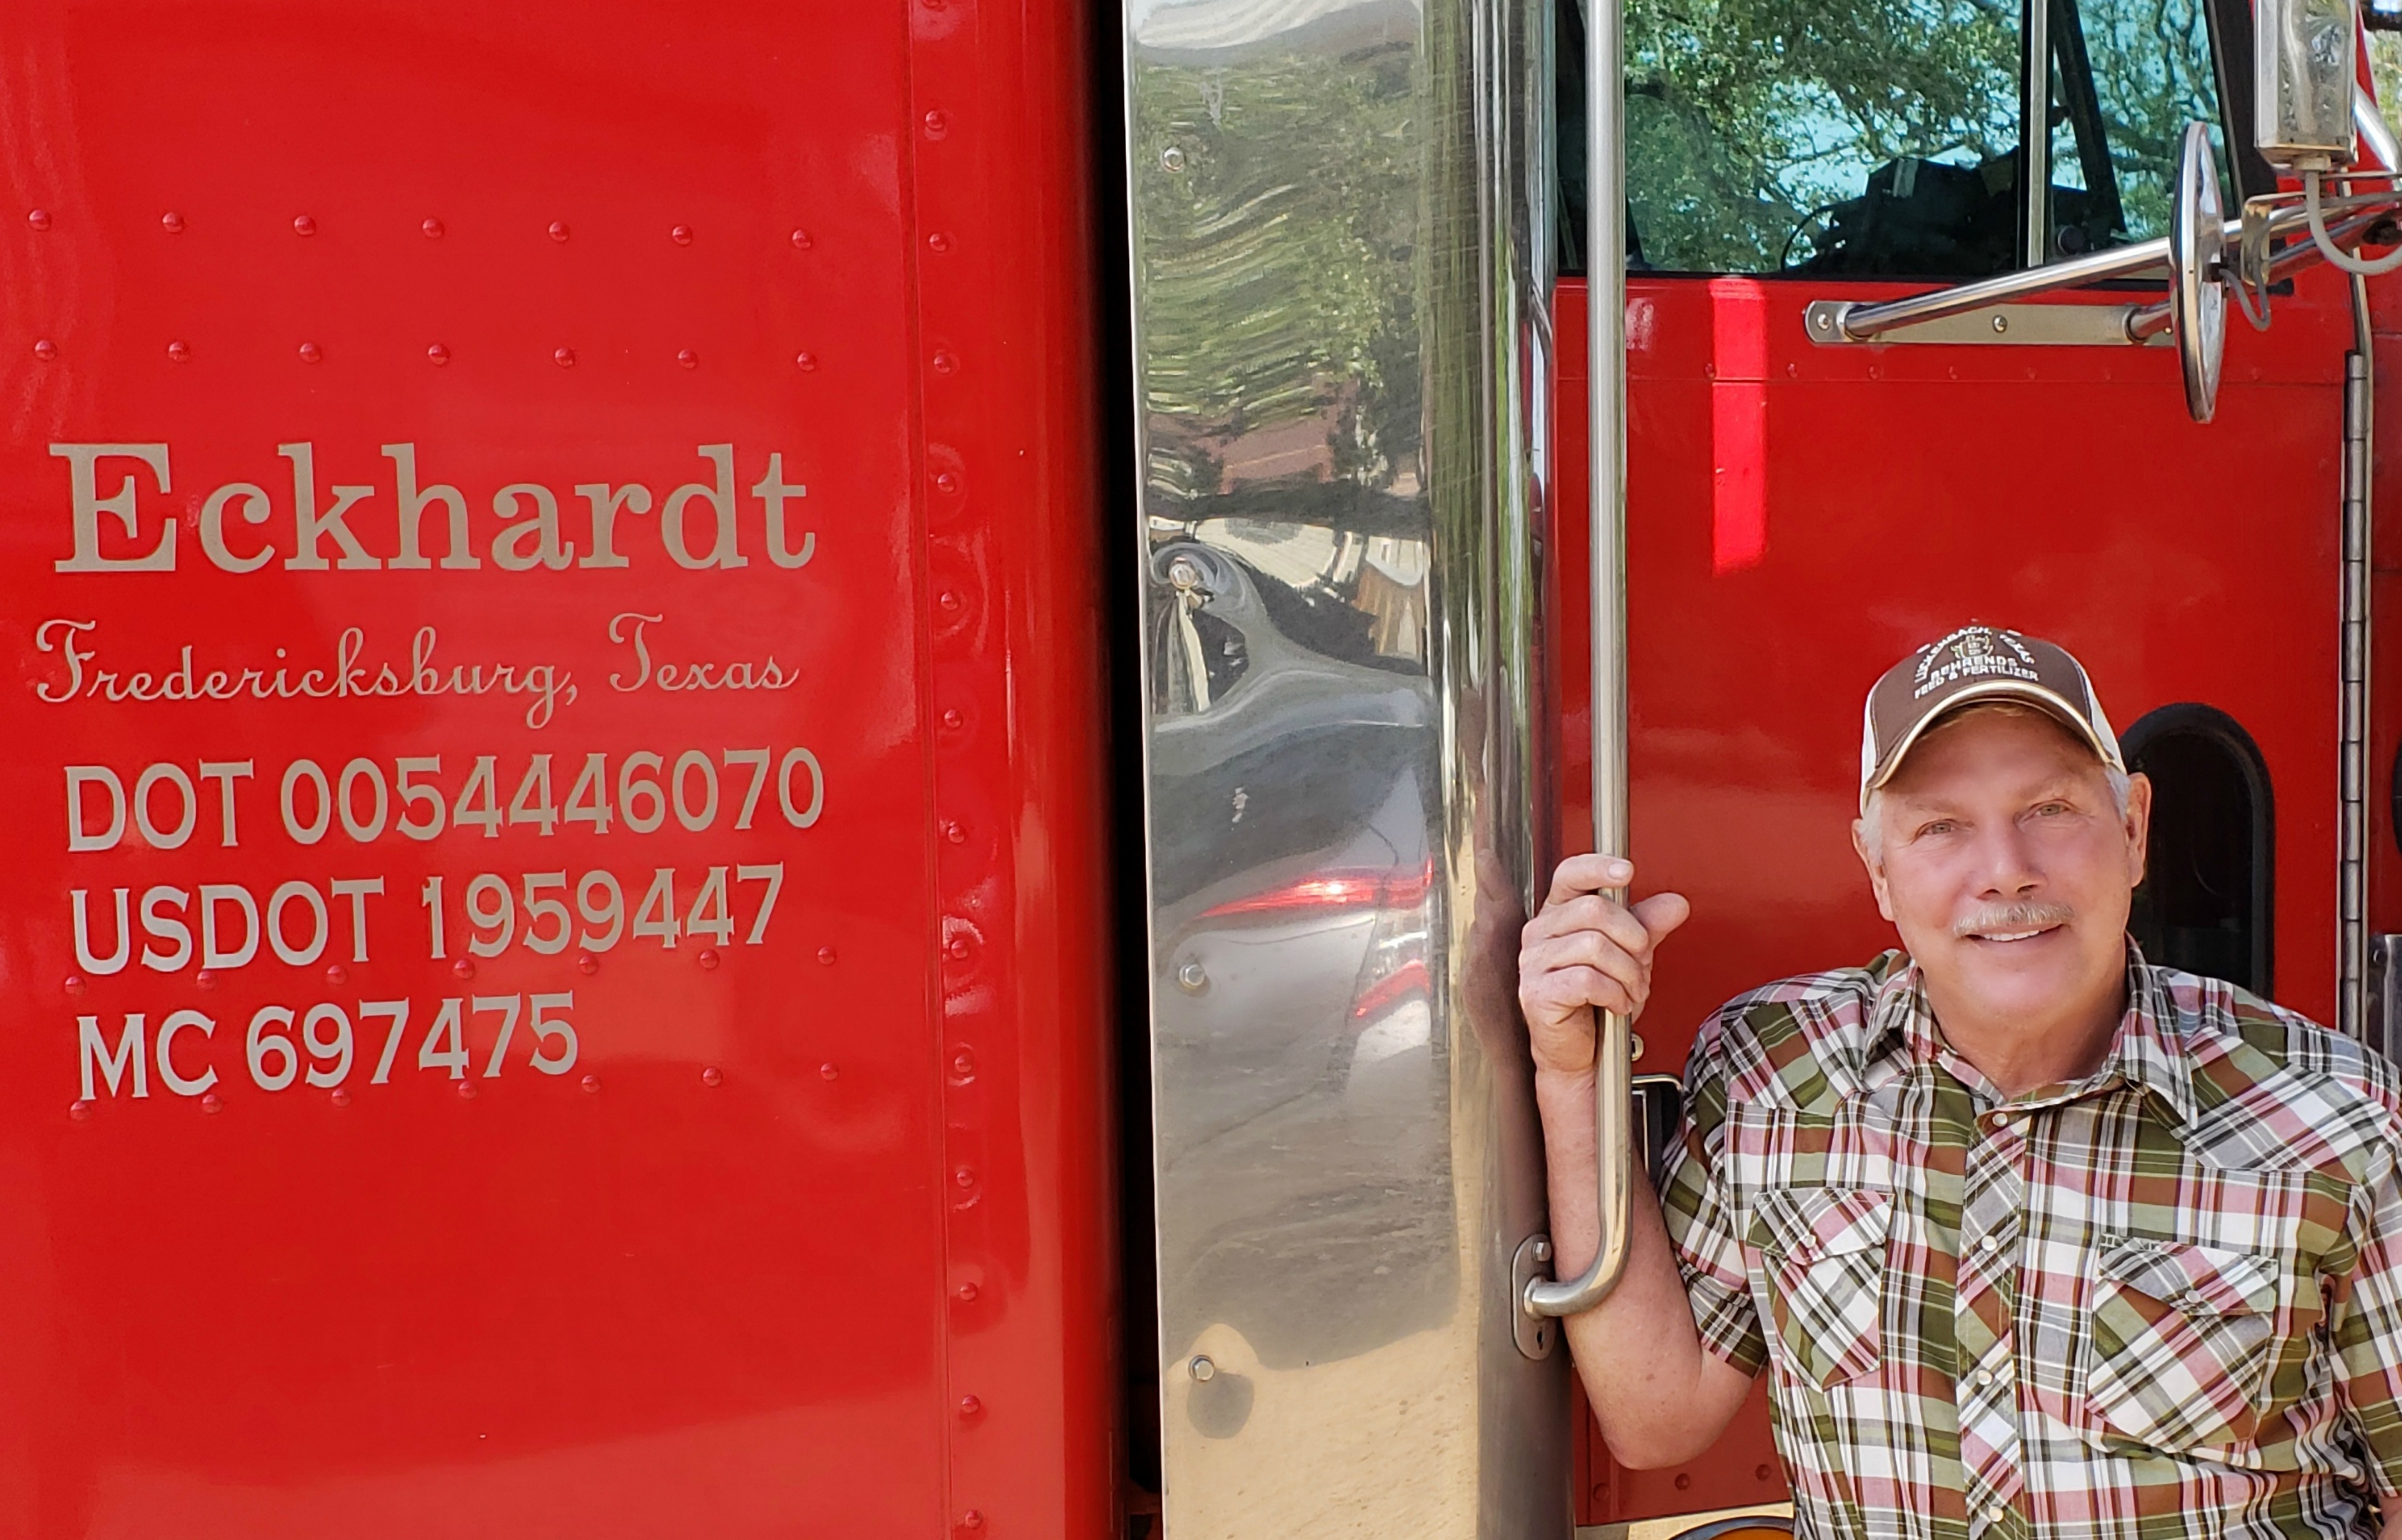 Eckhardt Trucking Fredericksburg, Texas